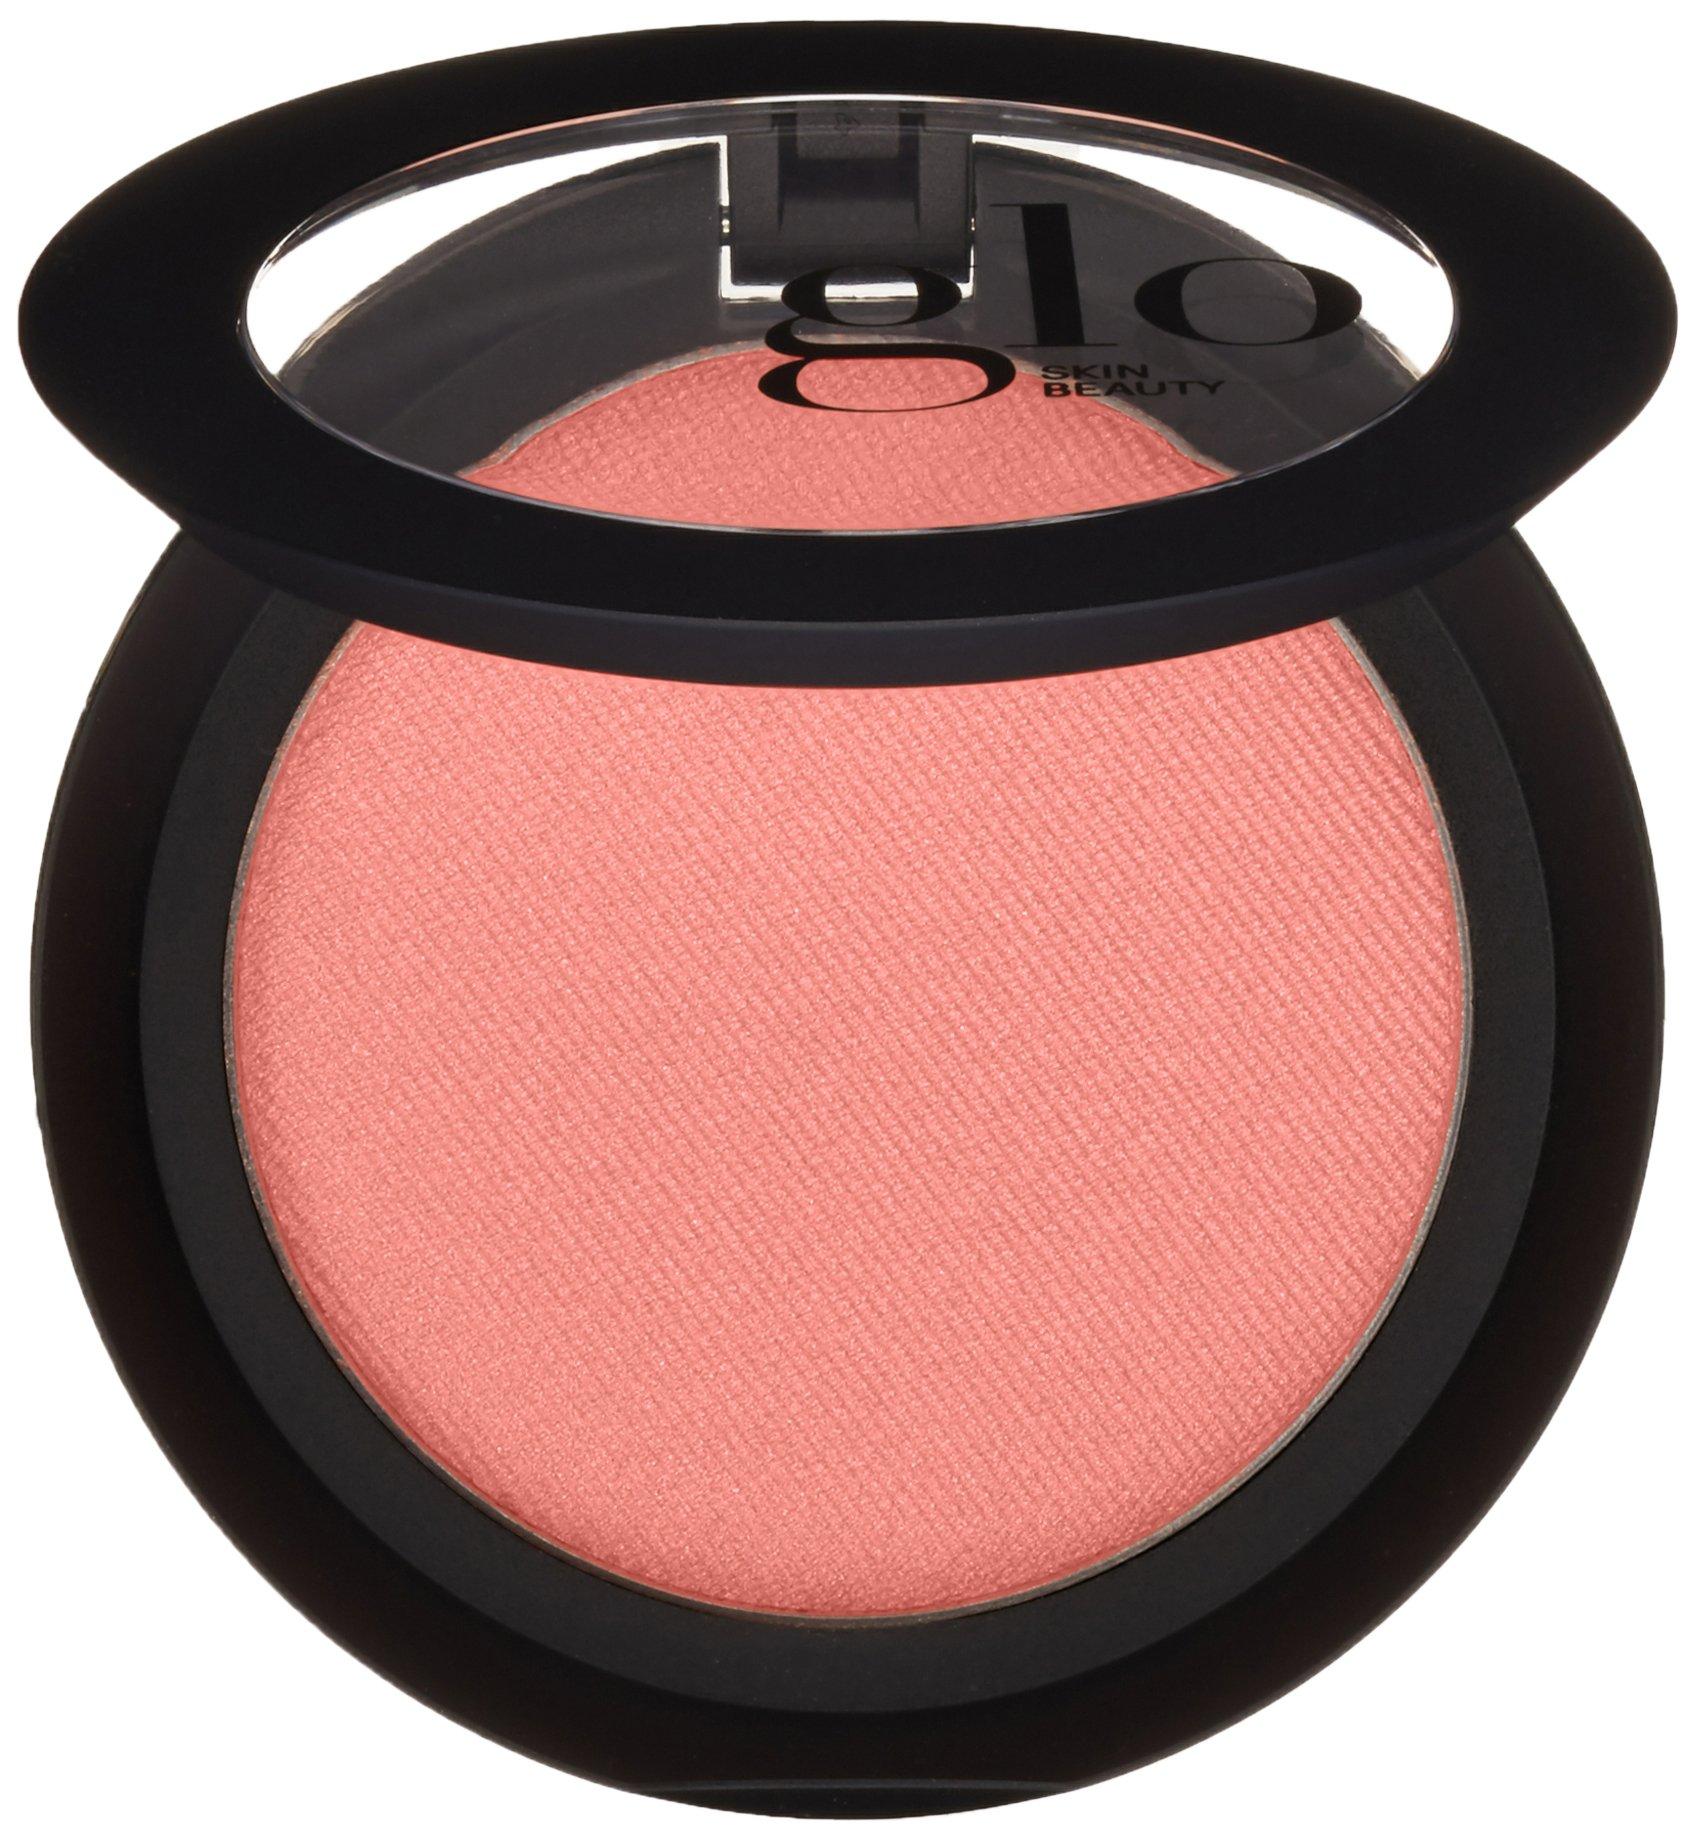 Glo Skin Beauty Powder Blush in Papaya - Matte Pink Coral   9 Shades   Cruelty Free, Talc Free Mineral Makeup